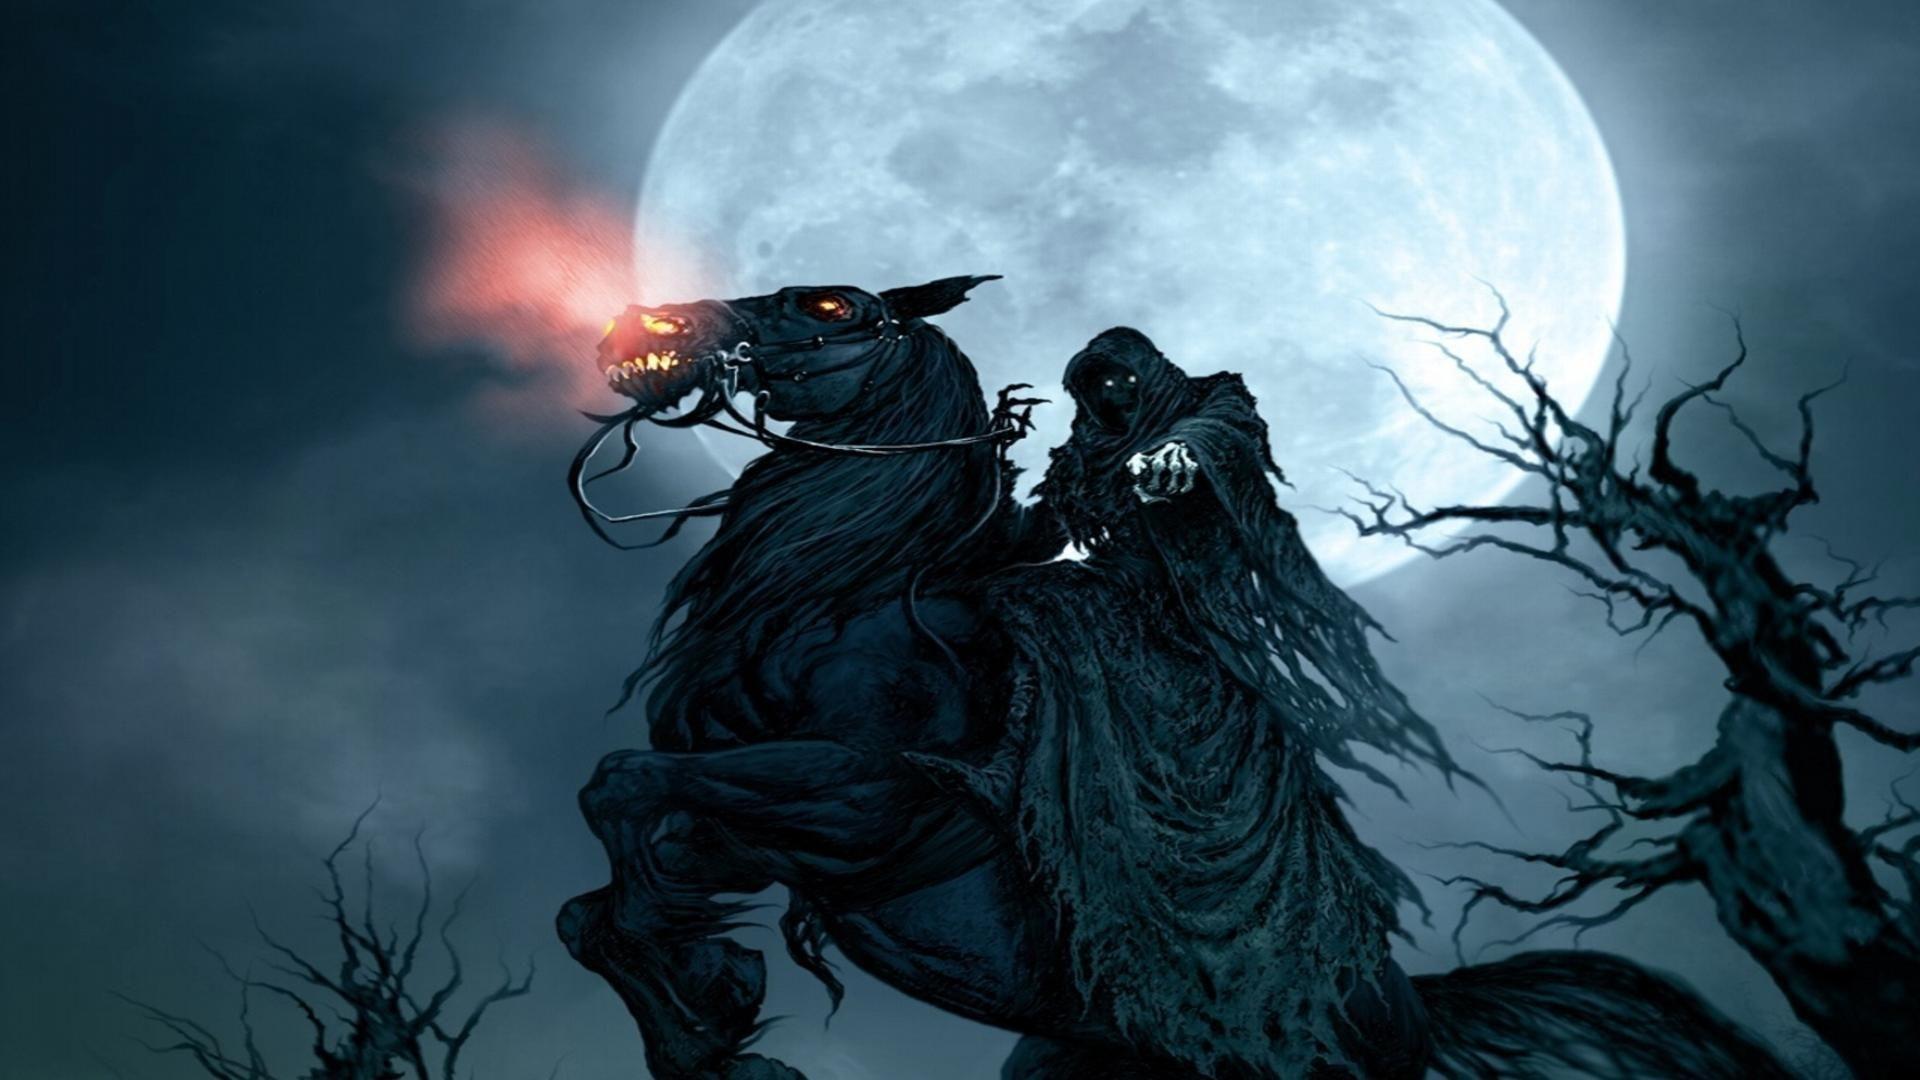 dark evil hd wallpapers 51 images